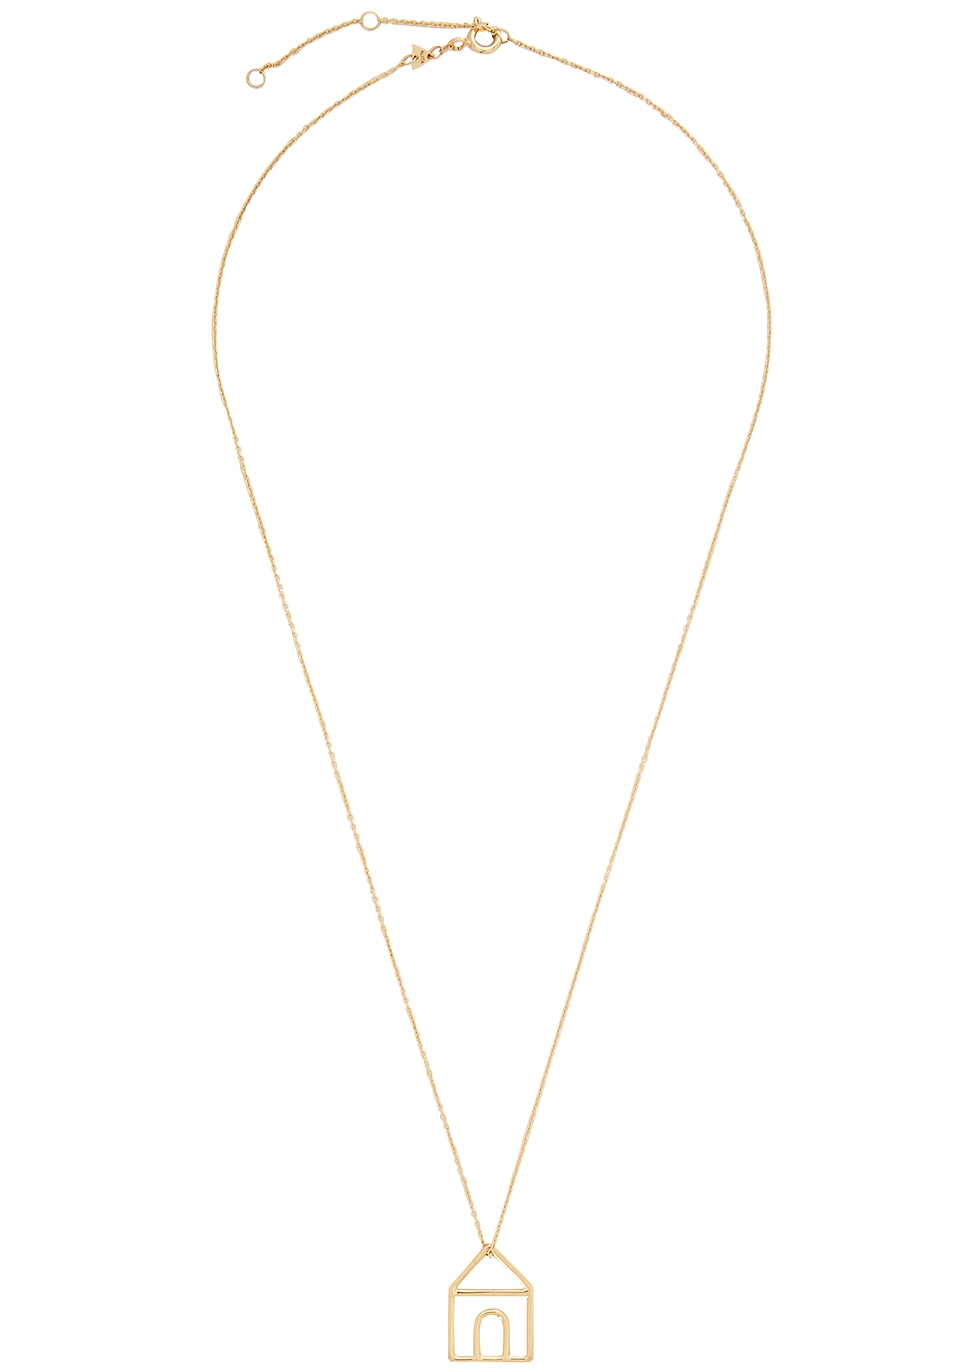 Casita Pura 9kt gold necklace